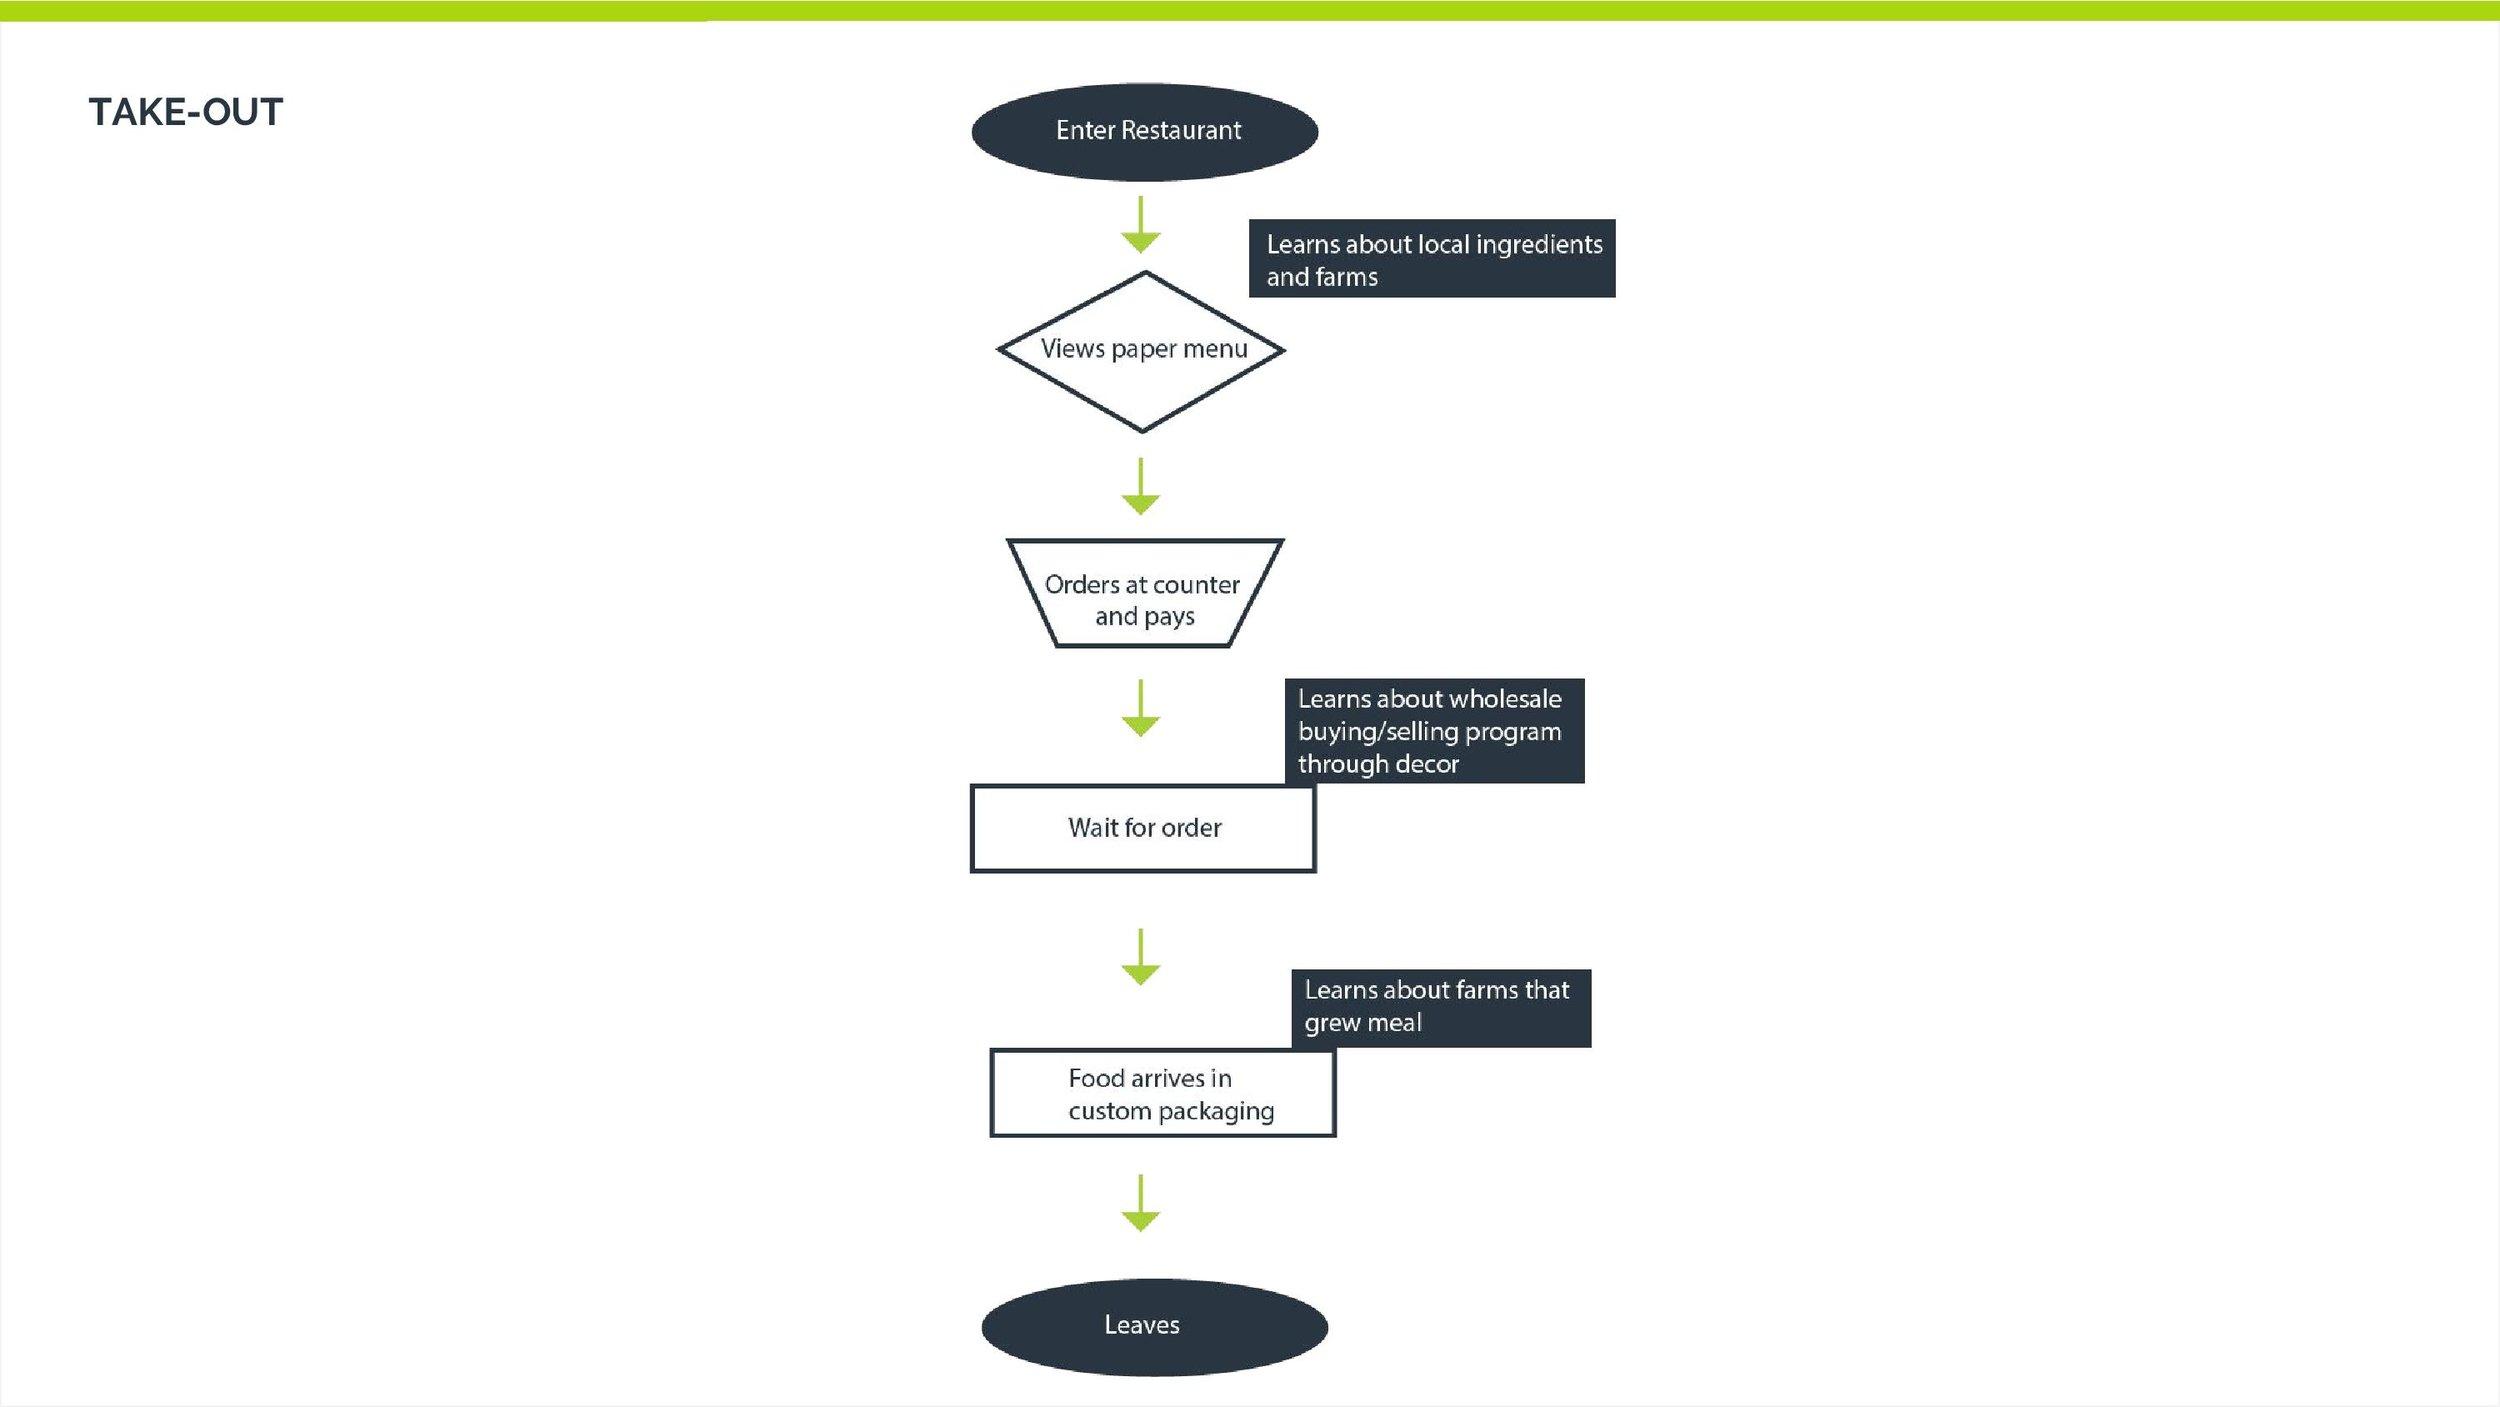 AdvUX_FinalPresentation-page-035.jpg